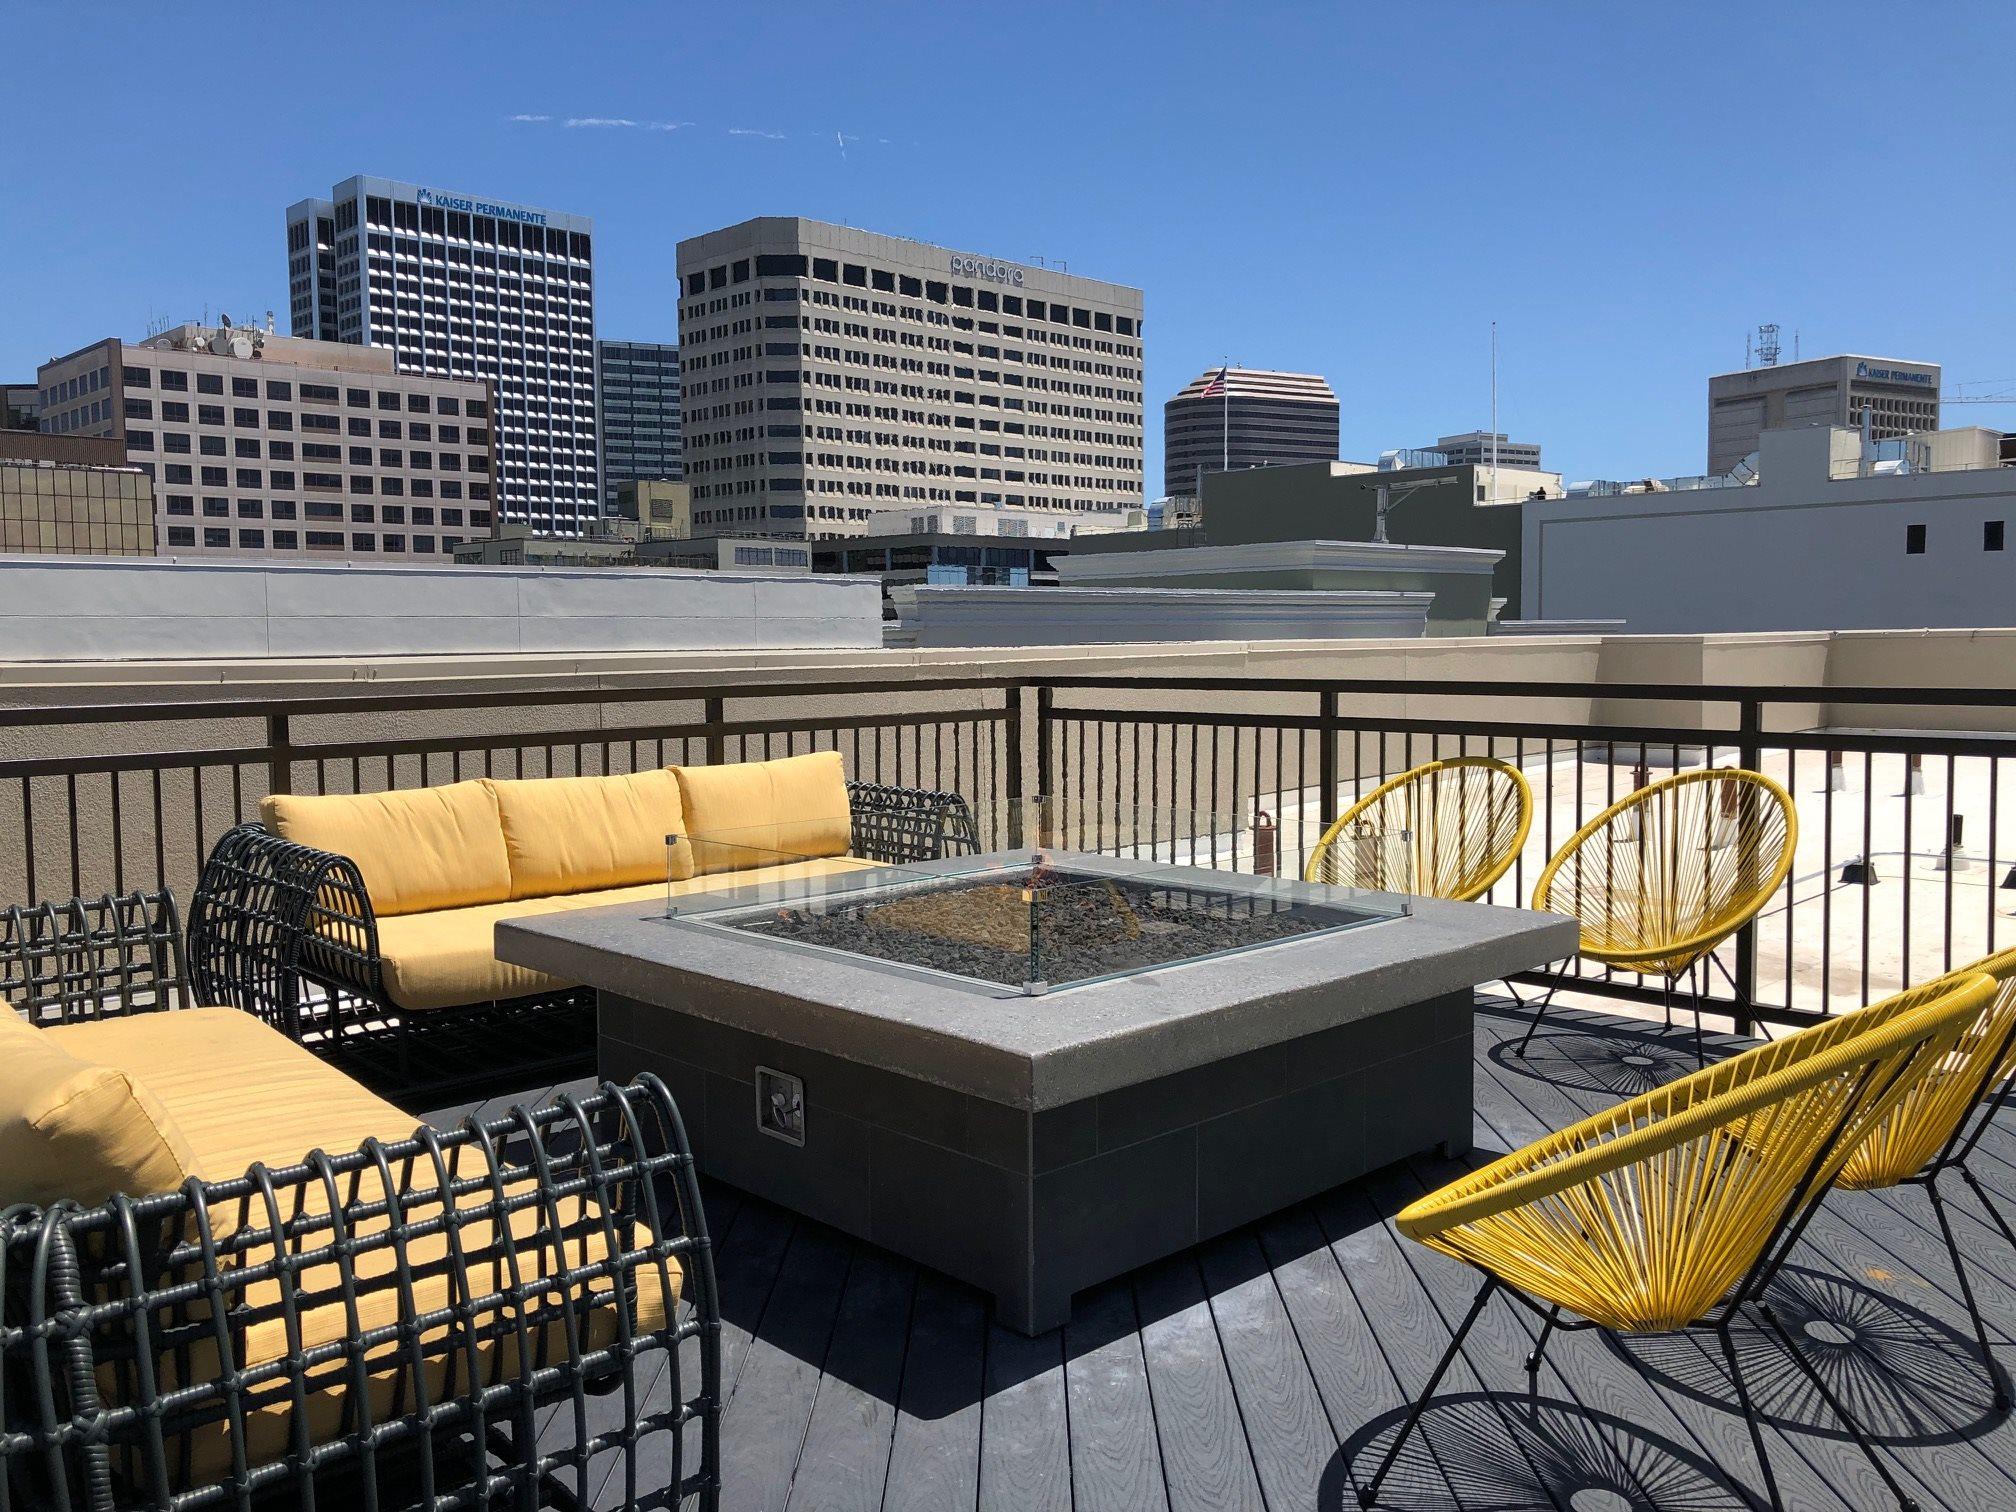 Fire pit l Rasa Apartments in Oakland CA